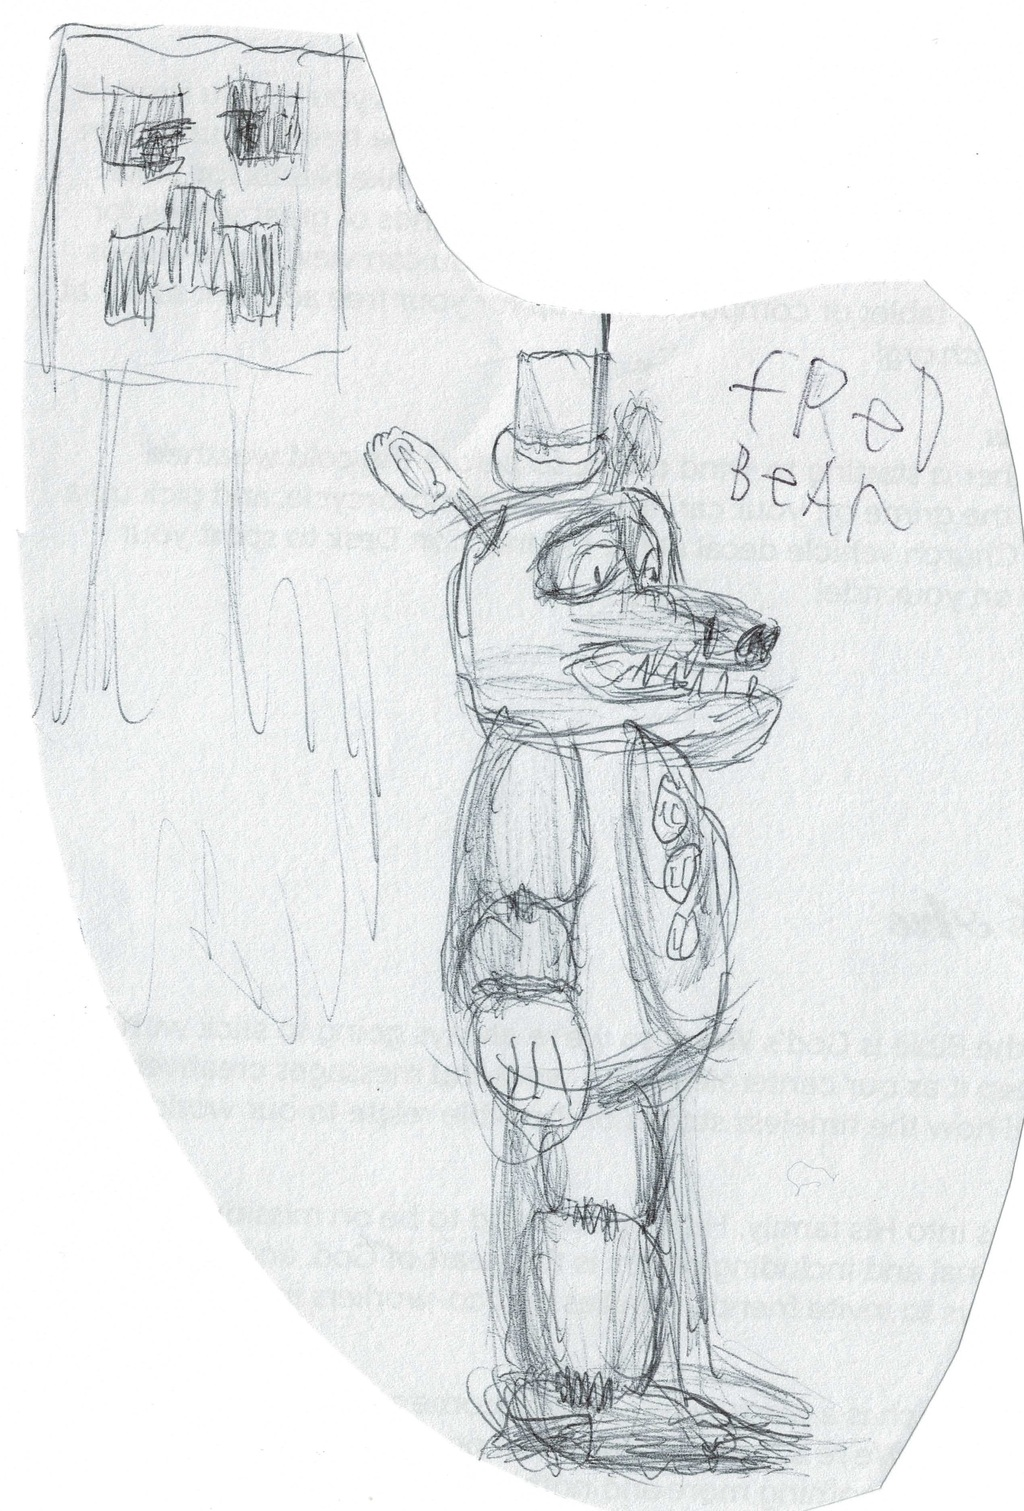 Fredbear and Creeper [My Art]